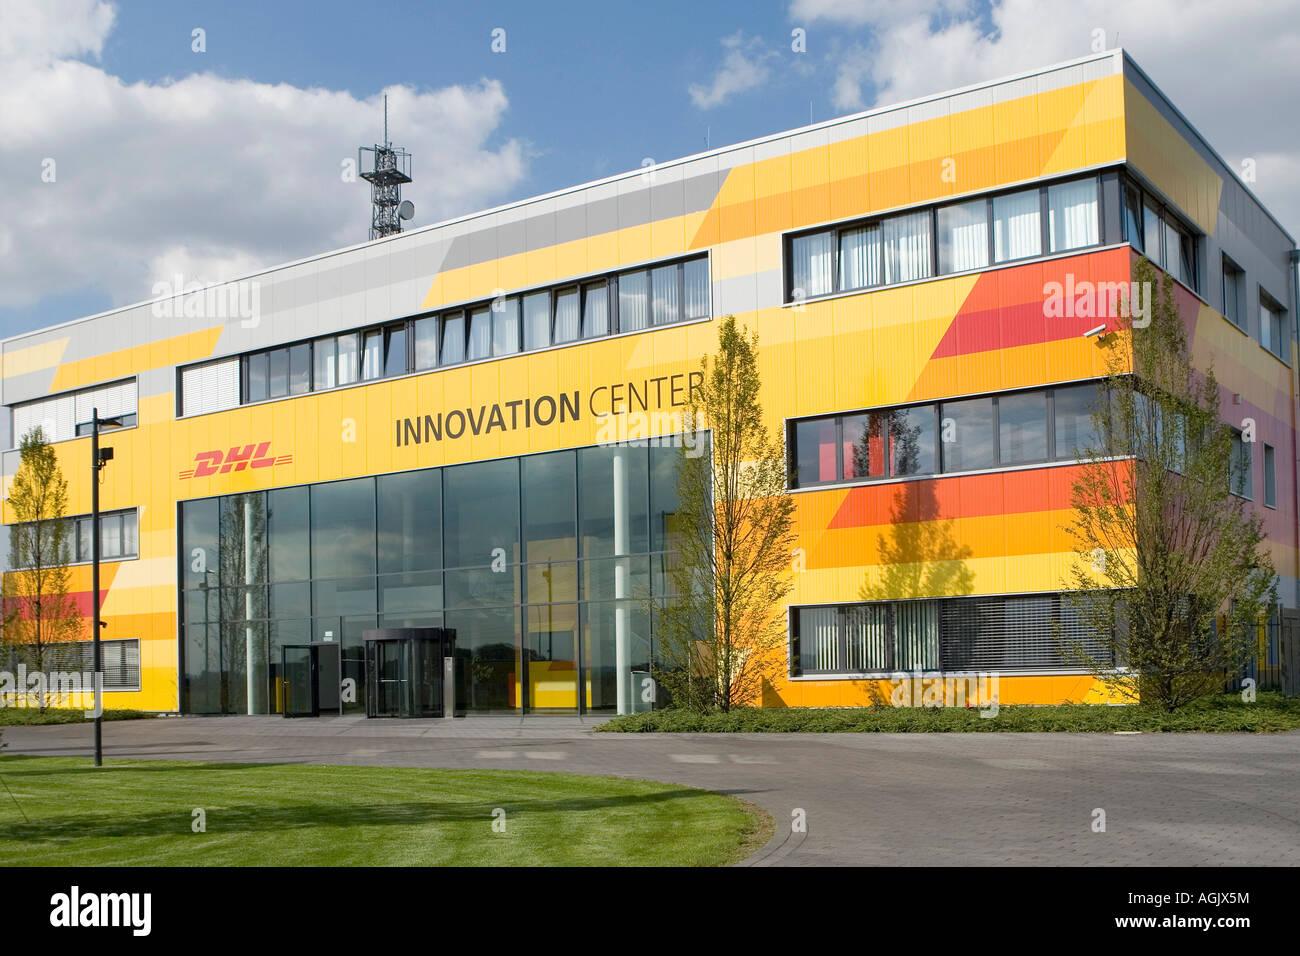 the dhl innovation center of the deutsche post world net in troisdorf stock photo 14227423 alamy. Black Bedroom Furniture Sets. Home Design Ideas